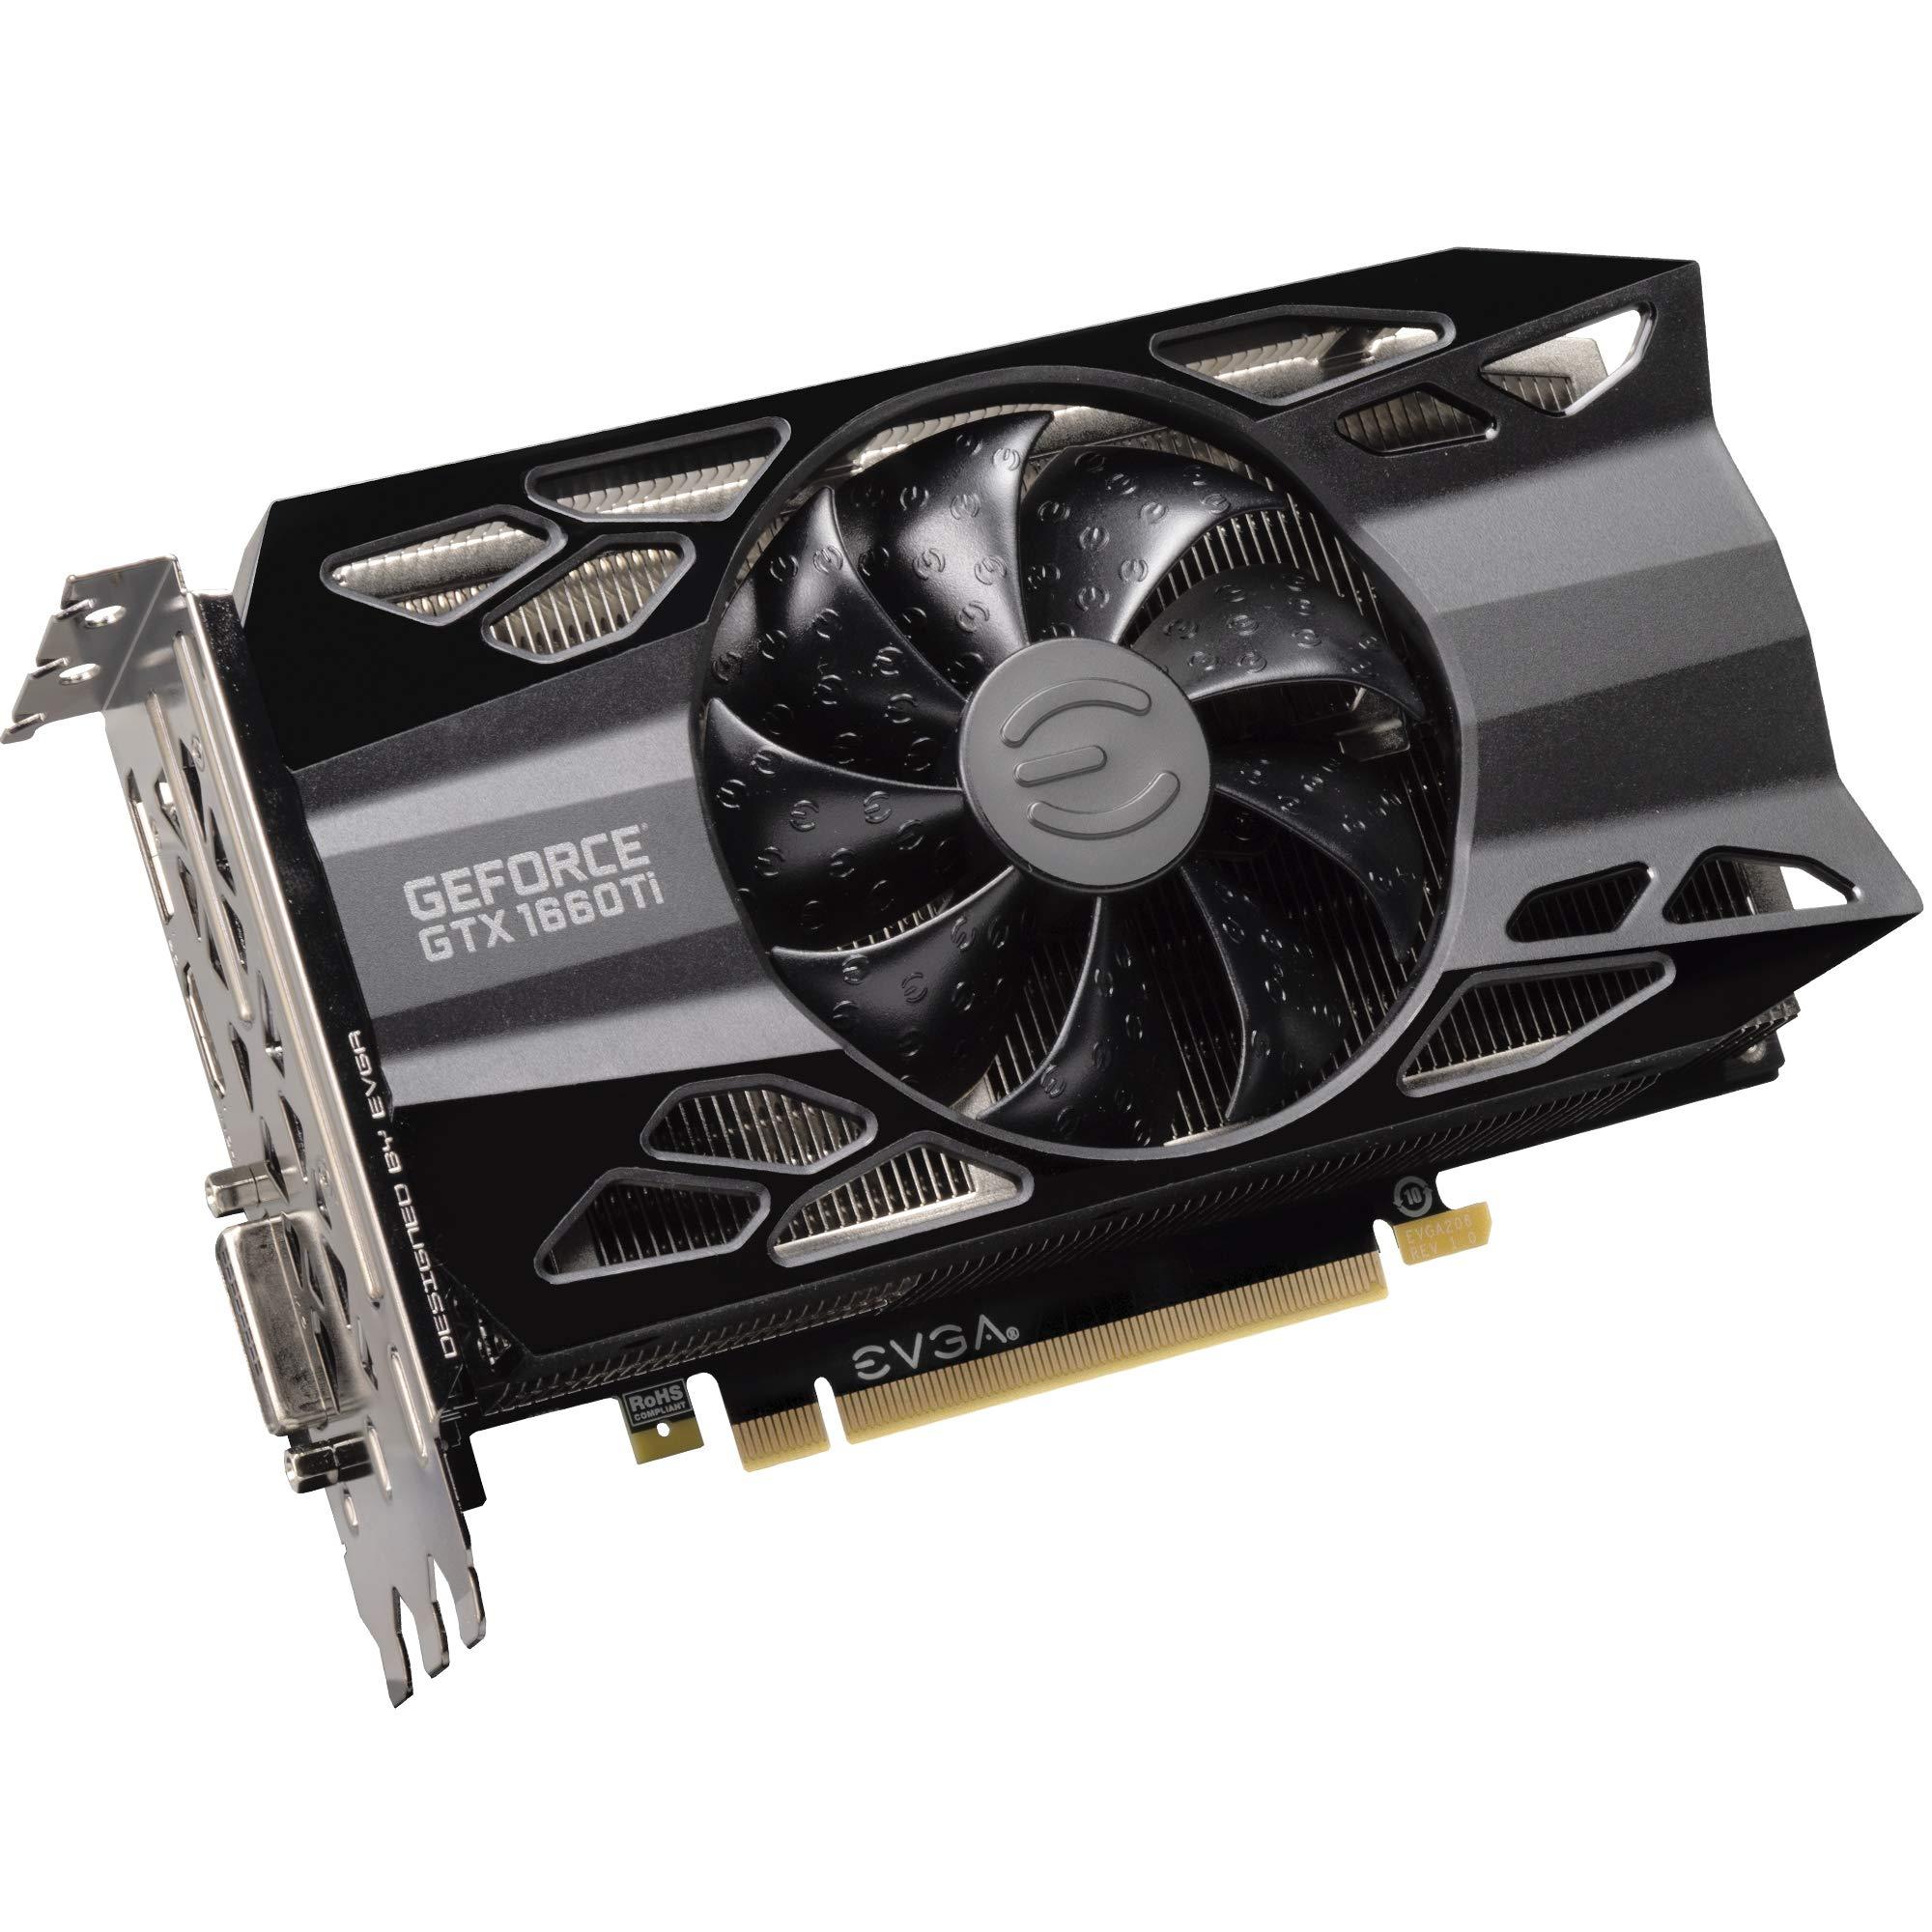 EVGA GeForce GTX 1660 Ti XC Black Gaming, 6GB GDDR6, HDB Fan Graphics Card 06G-P4-1261-KR by EVGA (Image #4)